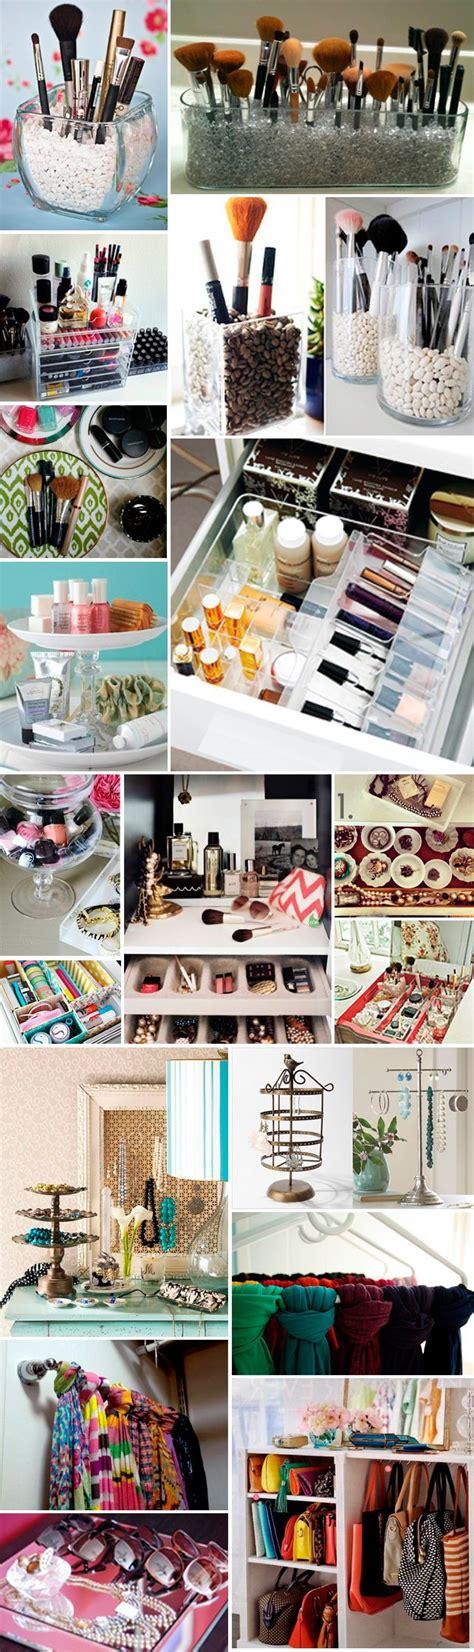 organization solutions 50 brilliant ways to organize home life